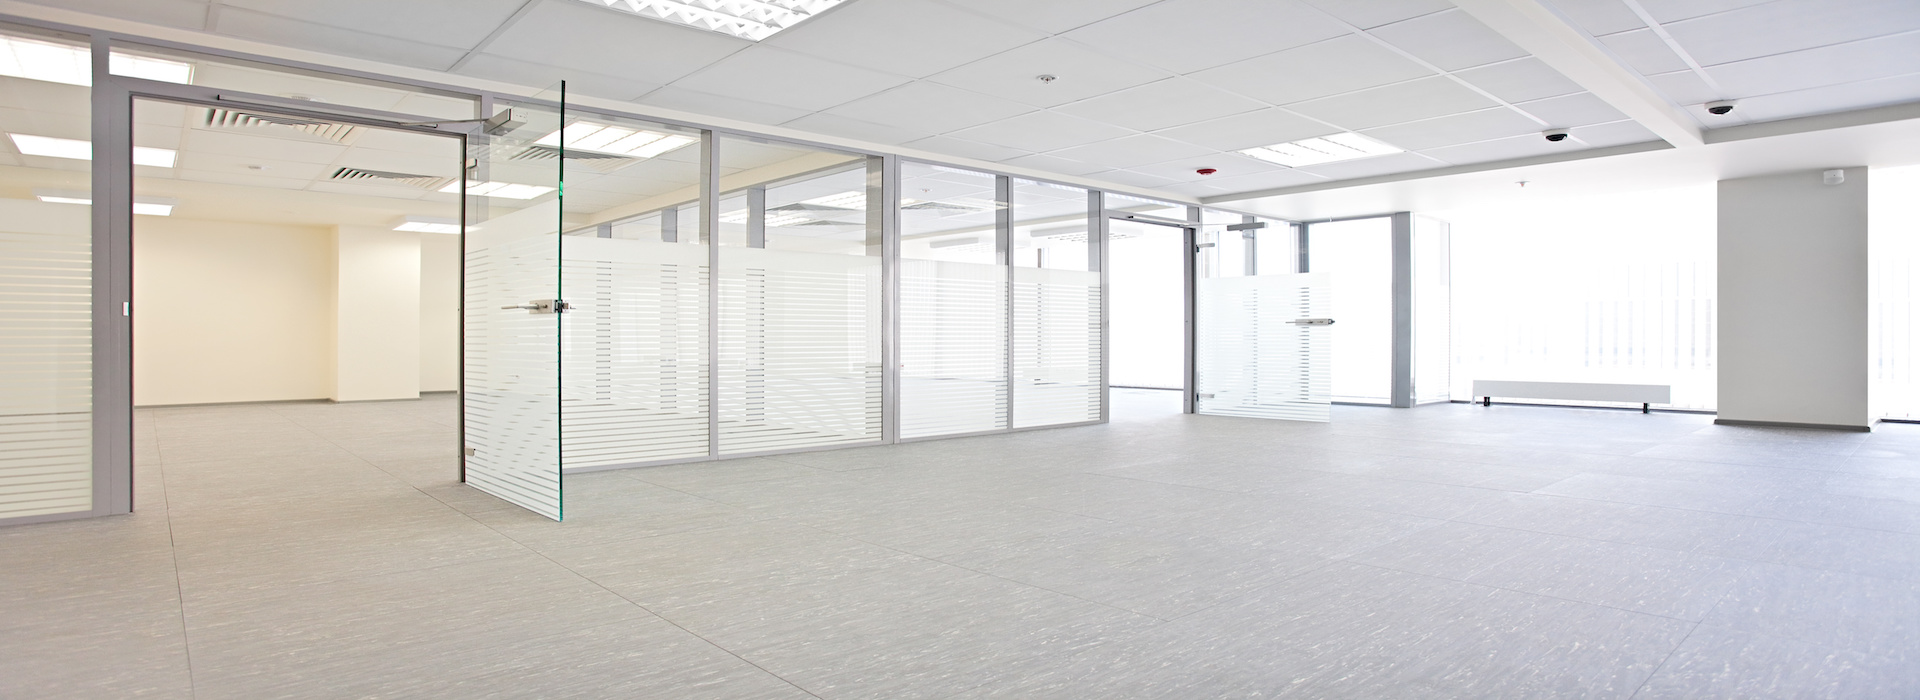 Shop fitout brisbane inlink constructions pty ltd ceilings partitions - Commercial office fit out ...